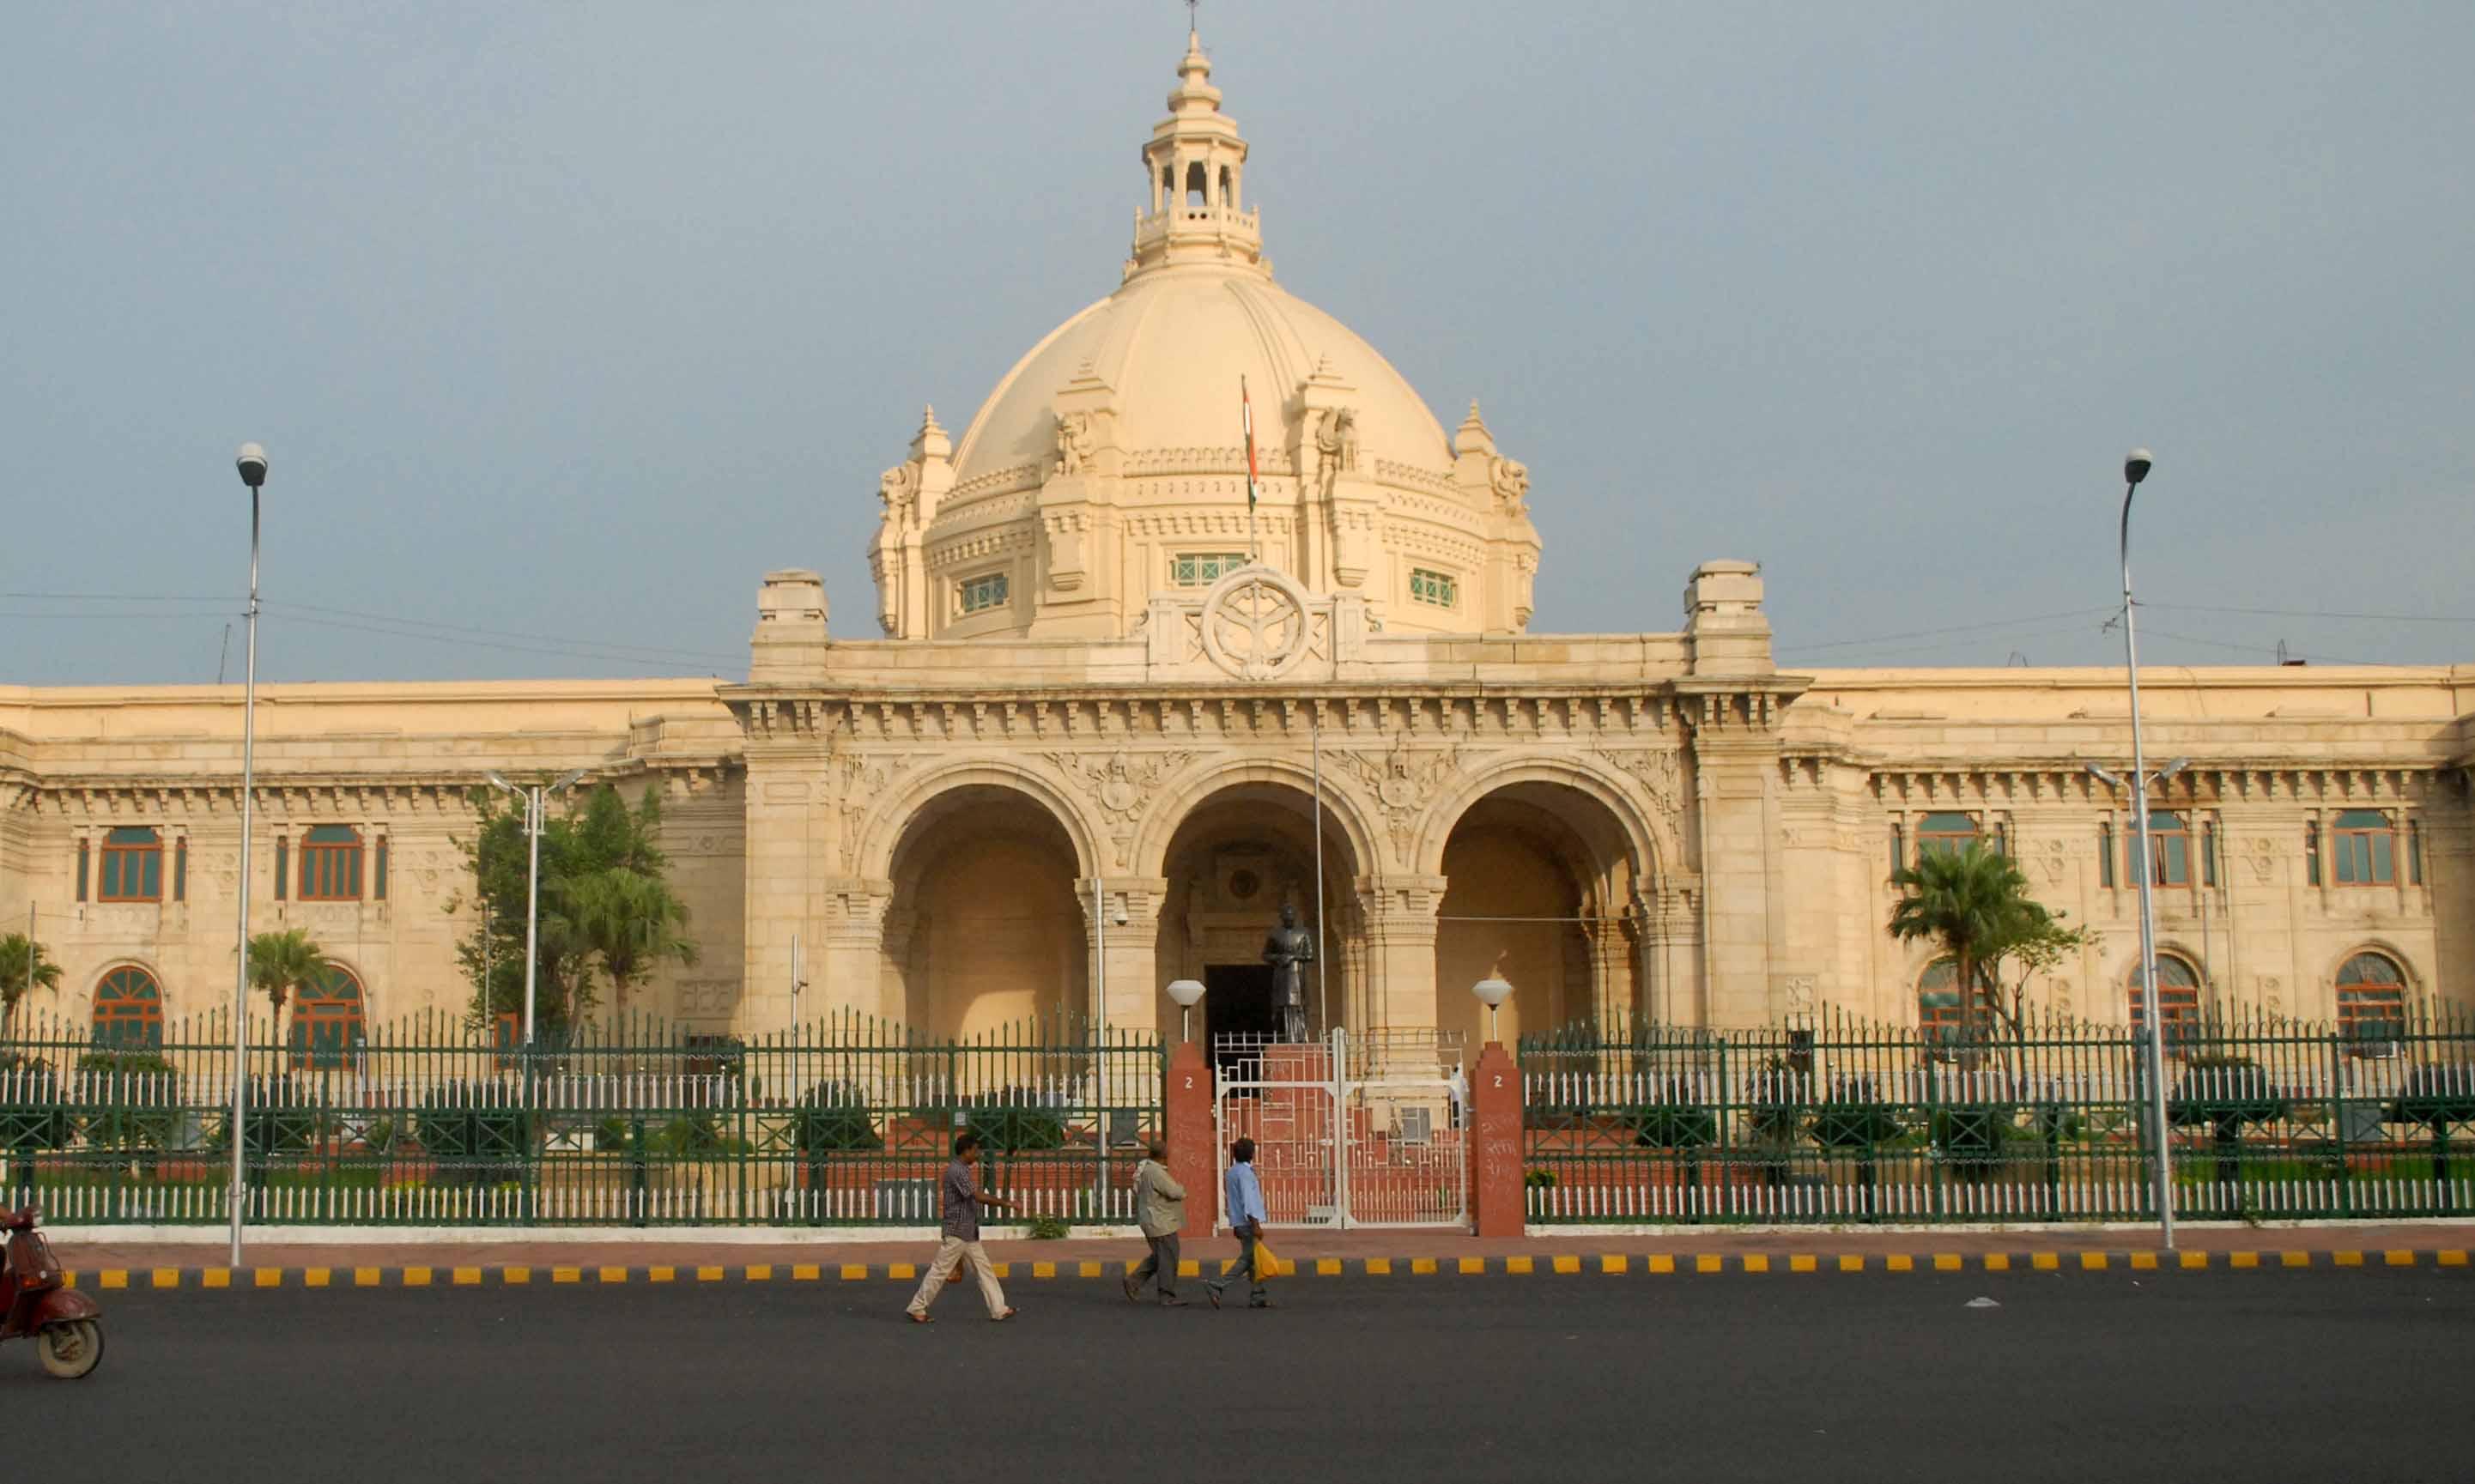 National Investigation Agency begins probe after PETN explosive found in Uttar Pradesh assembly